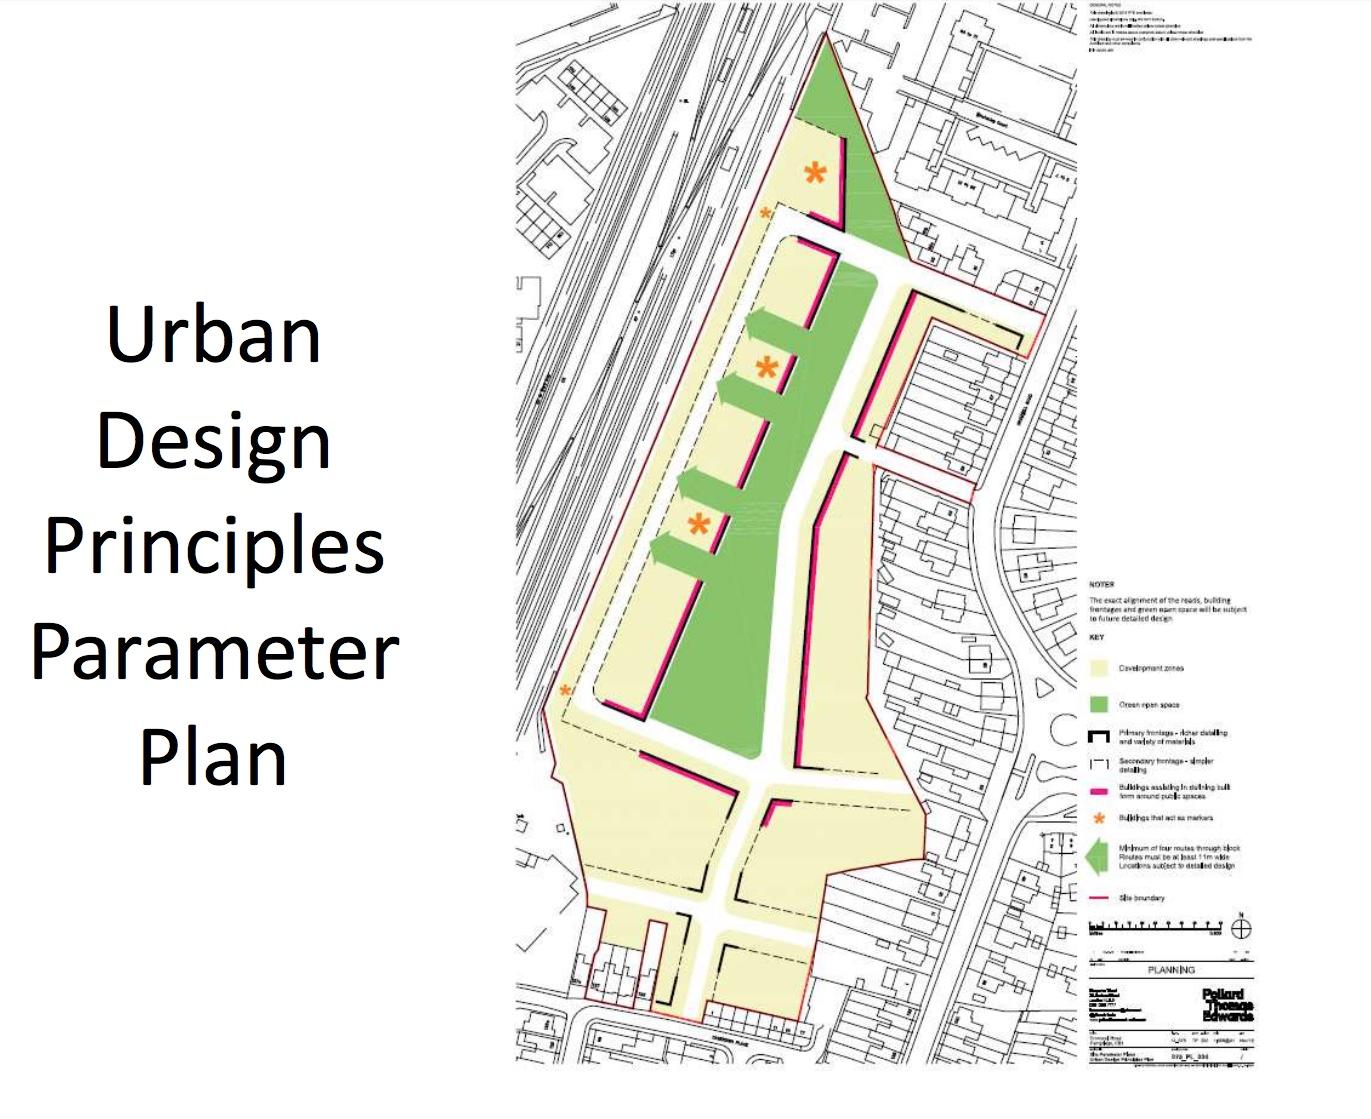 Urban_Design_Principles.jpeg